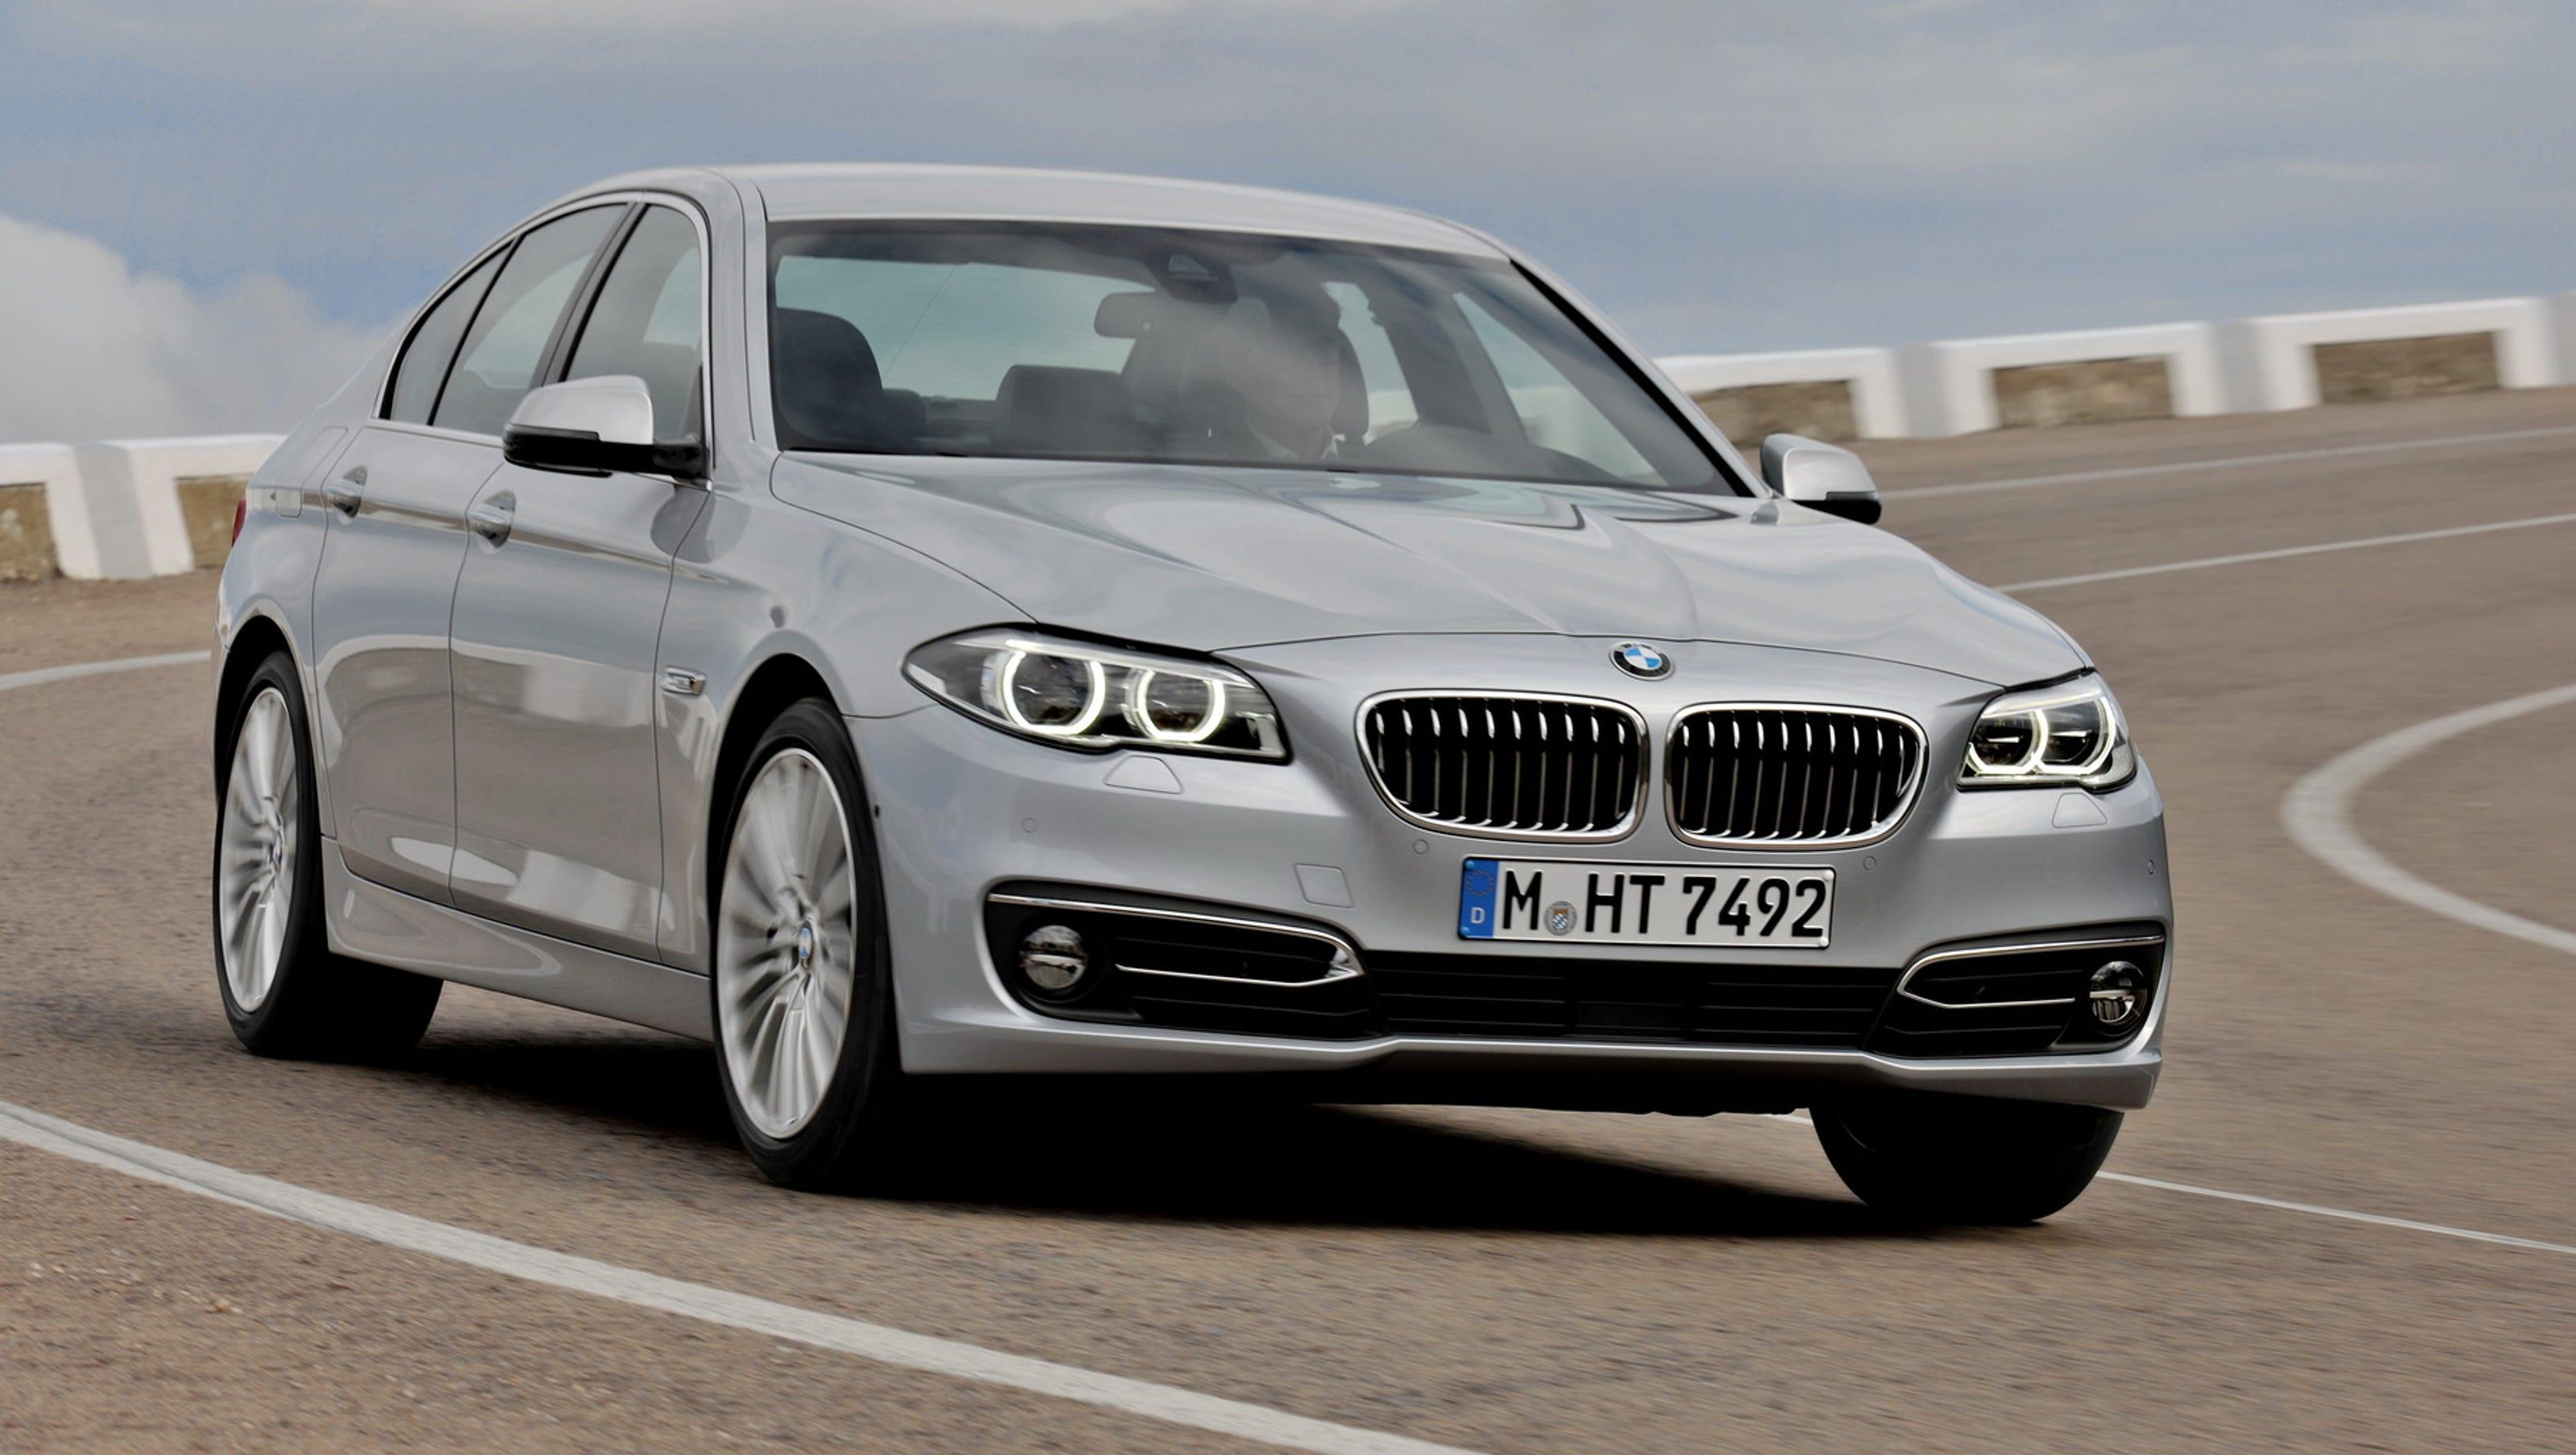 2015 BMW 5 Series sedan is an all around performer